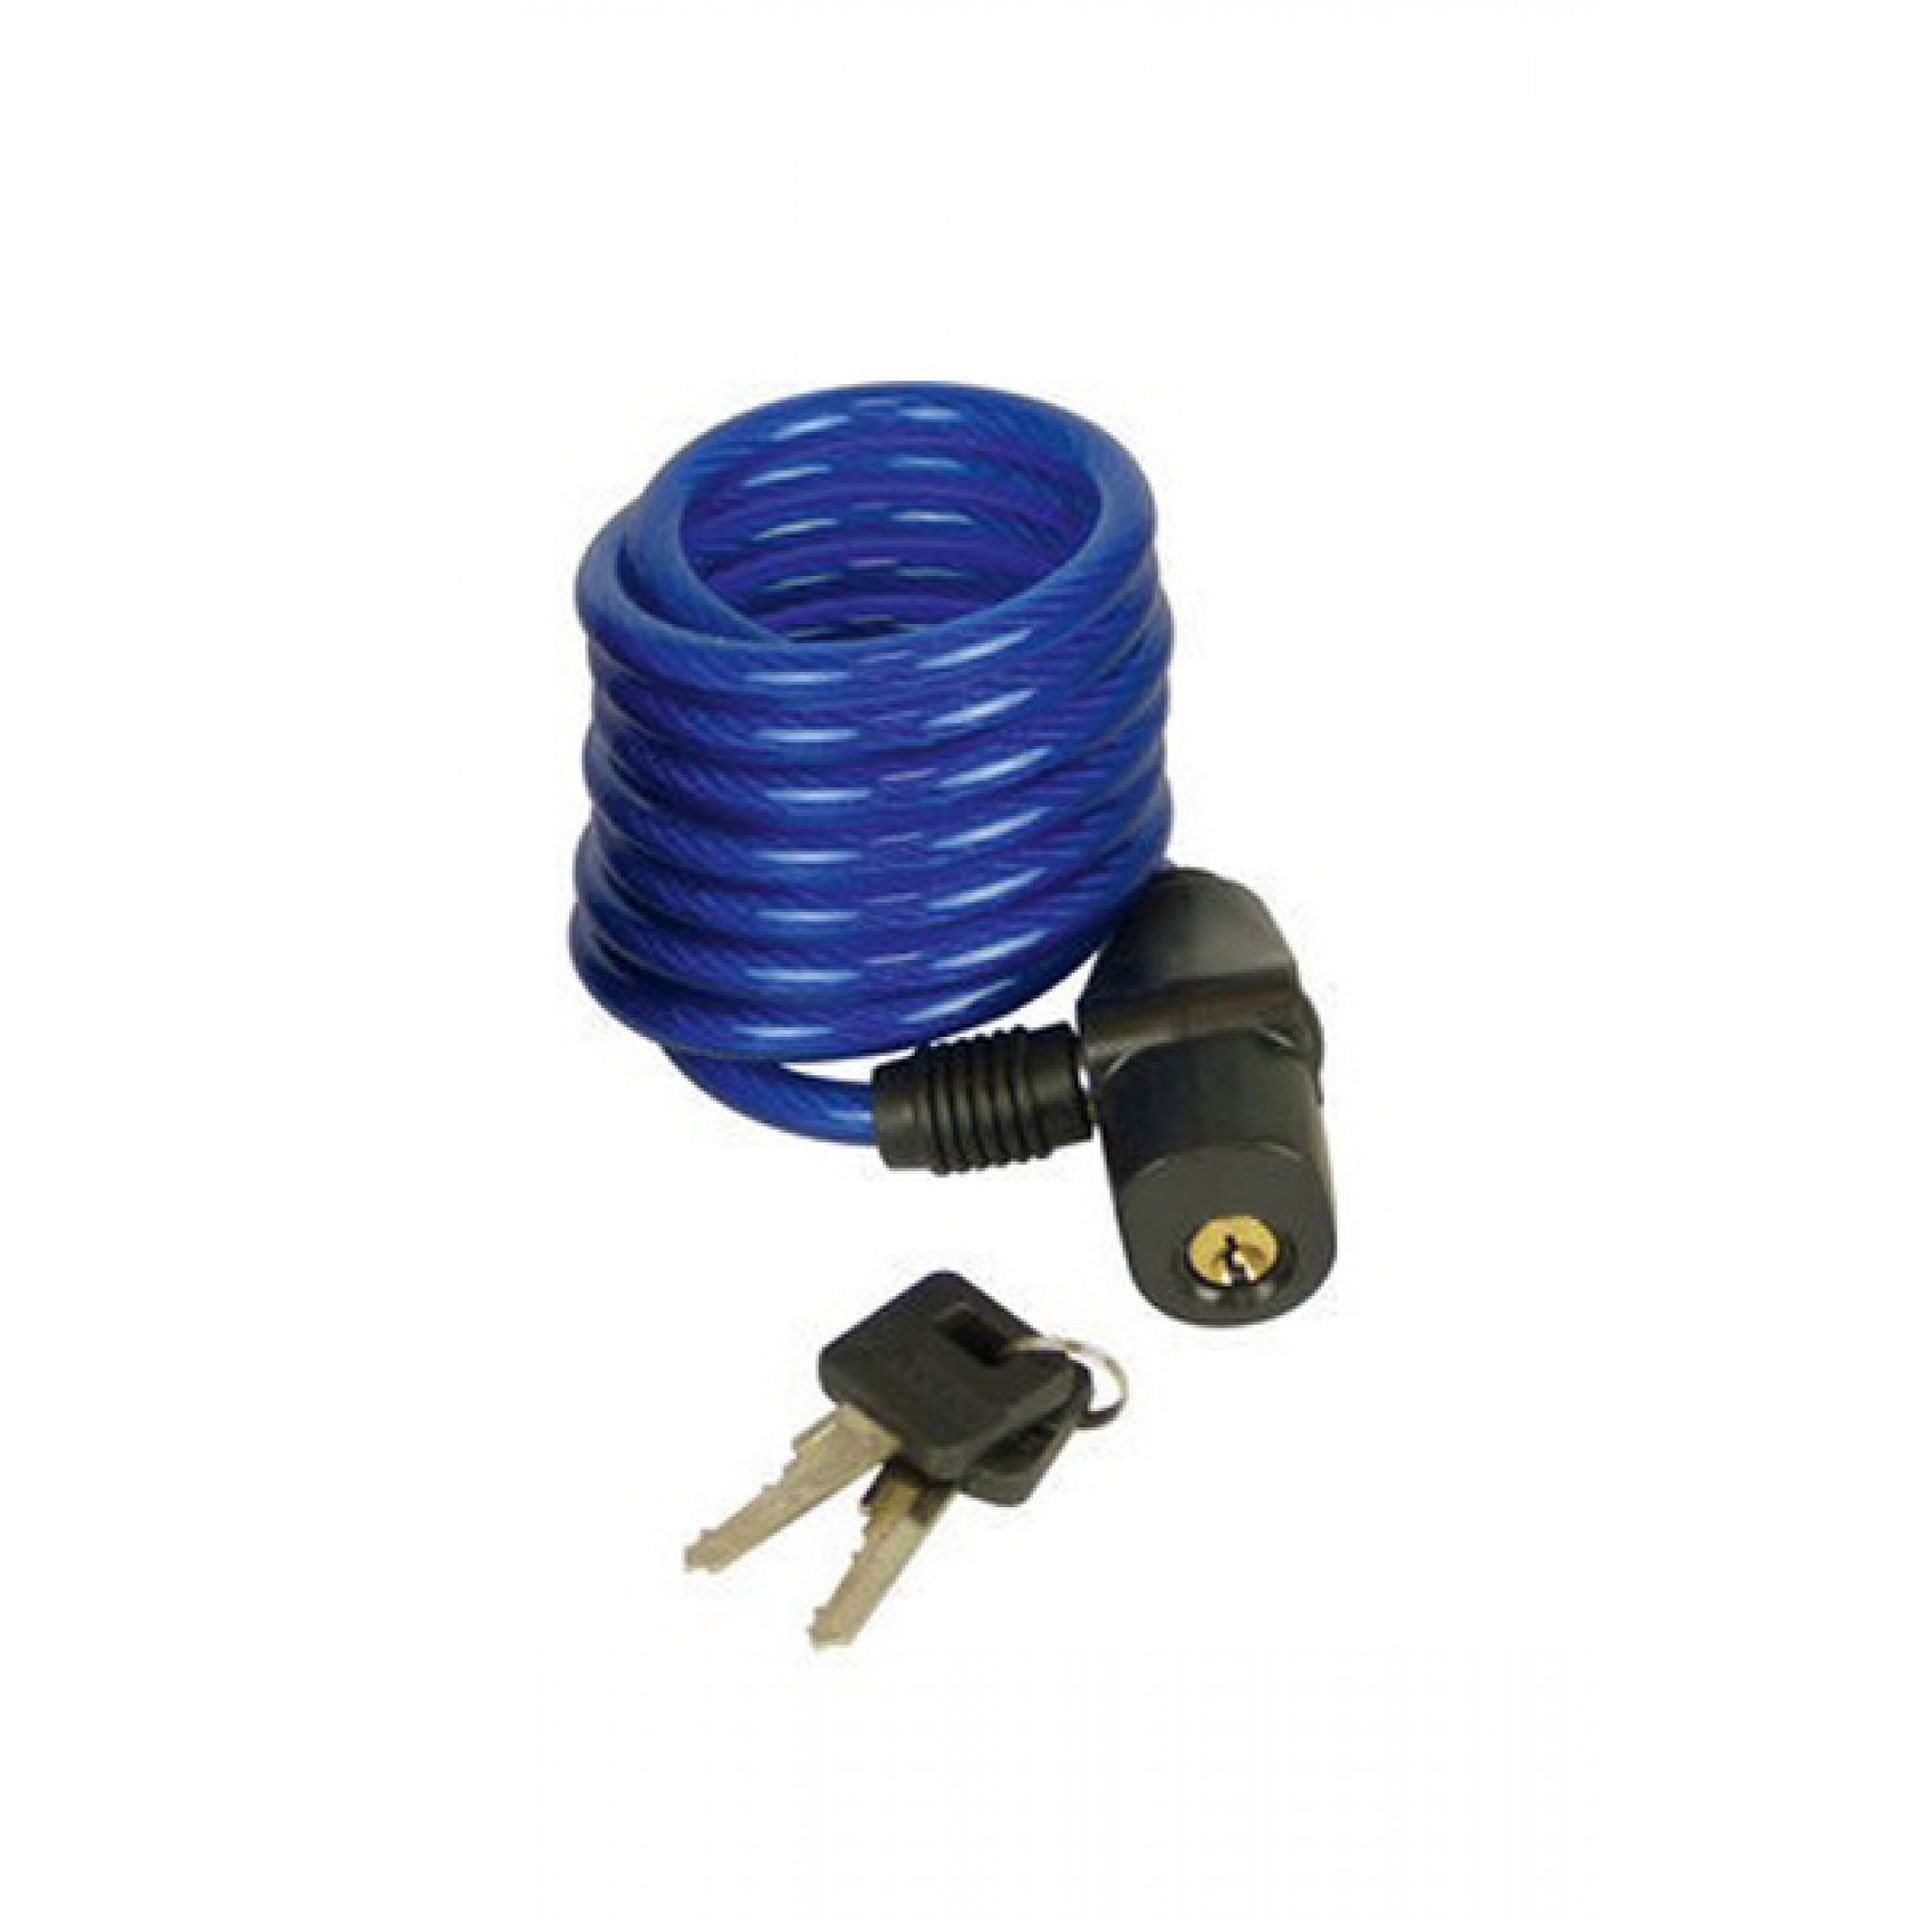 Zapięcie rowerowe Master Lock Quantum 8127 niebieskie